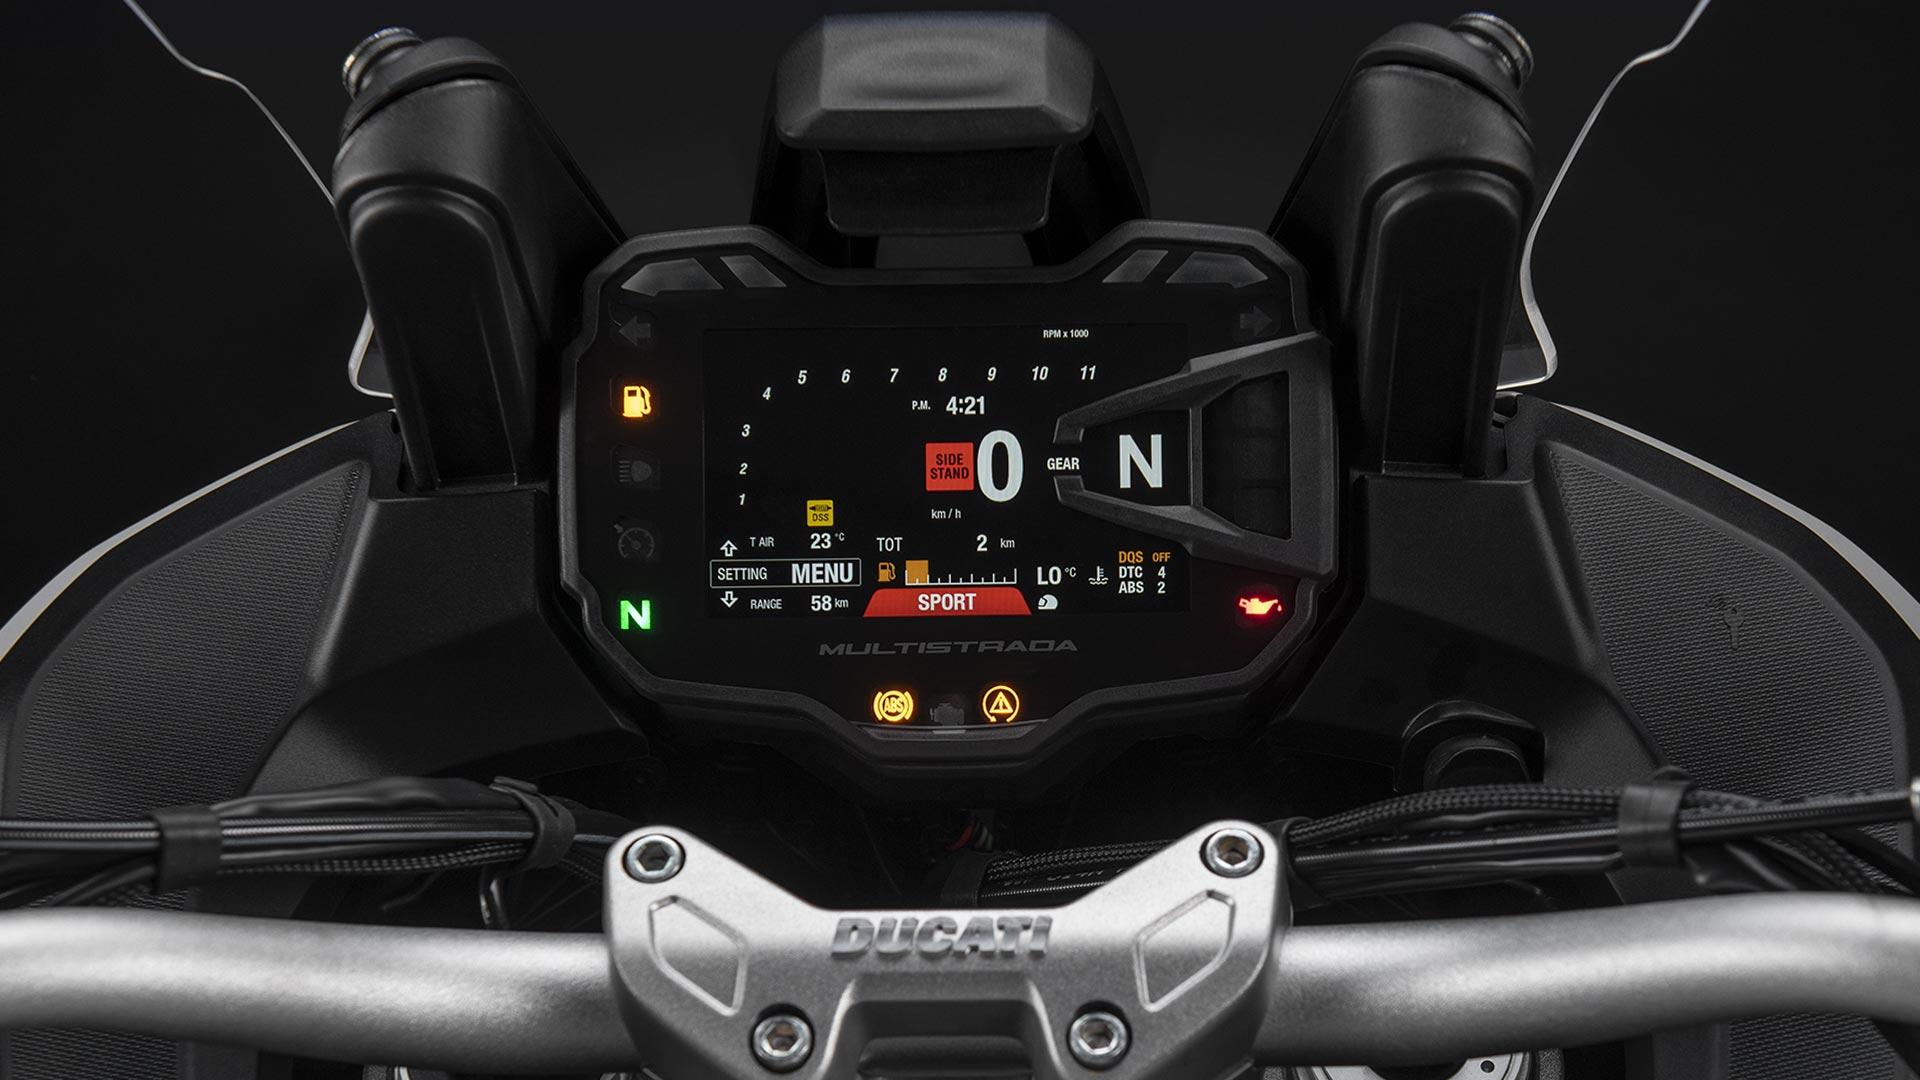 Ducati Multistrada 950 S รถทัวริ่งบิ๊กไบค์พันธุ์ดุจากอิตาลี5